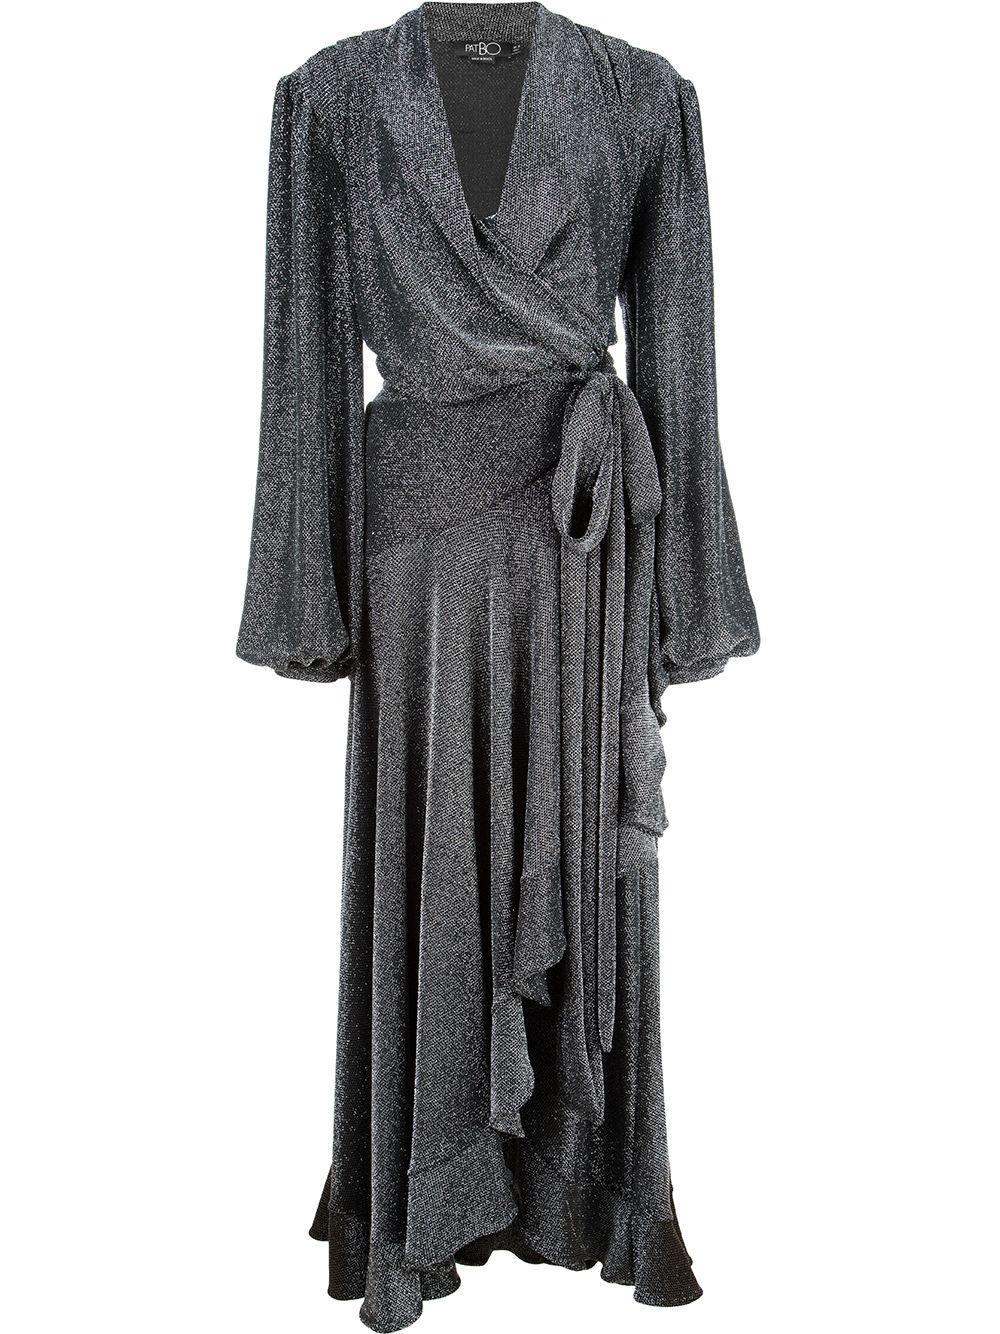 Metallic Mesh High Low Wrap Dress Item # VES2163CUS